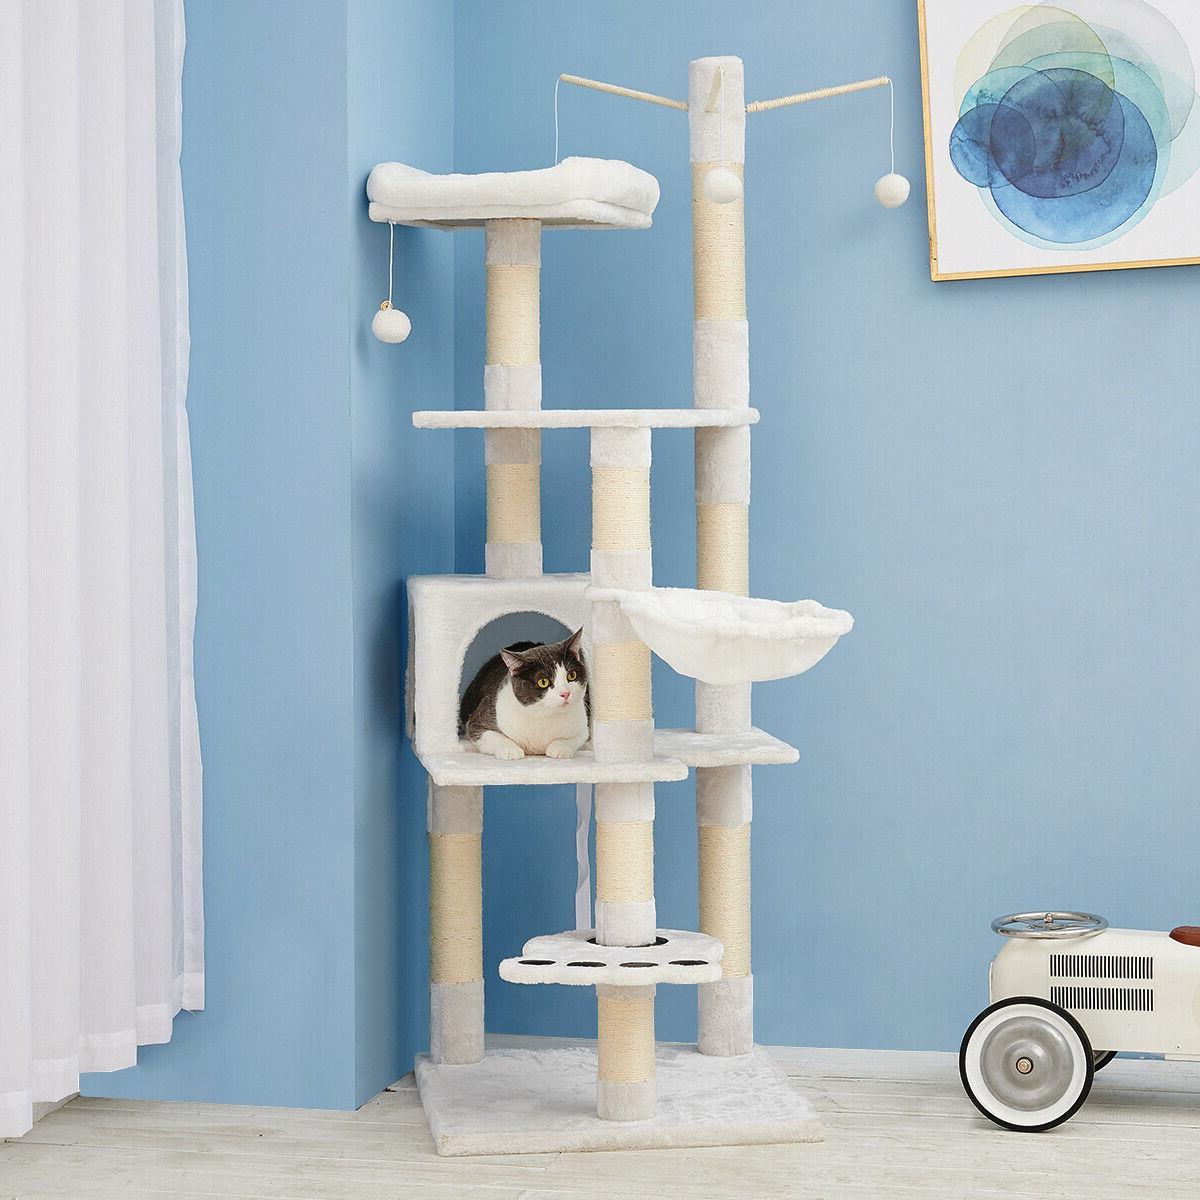 Sisal Post Cat Tree House Condo Tower Play Kitty Climbing